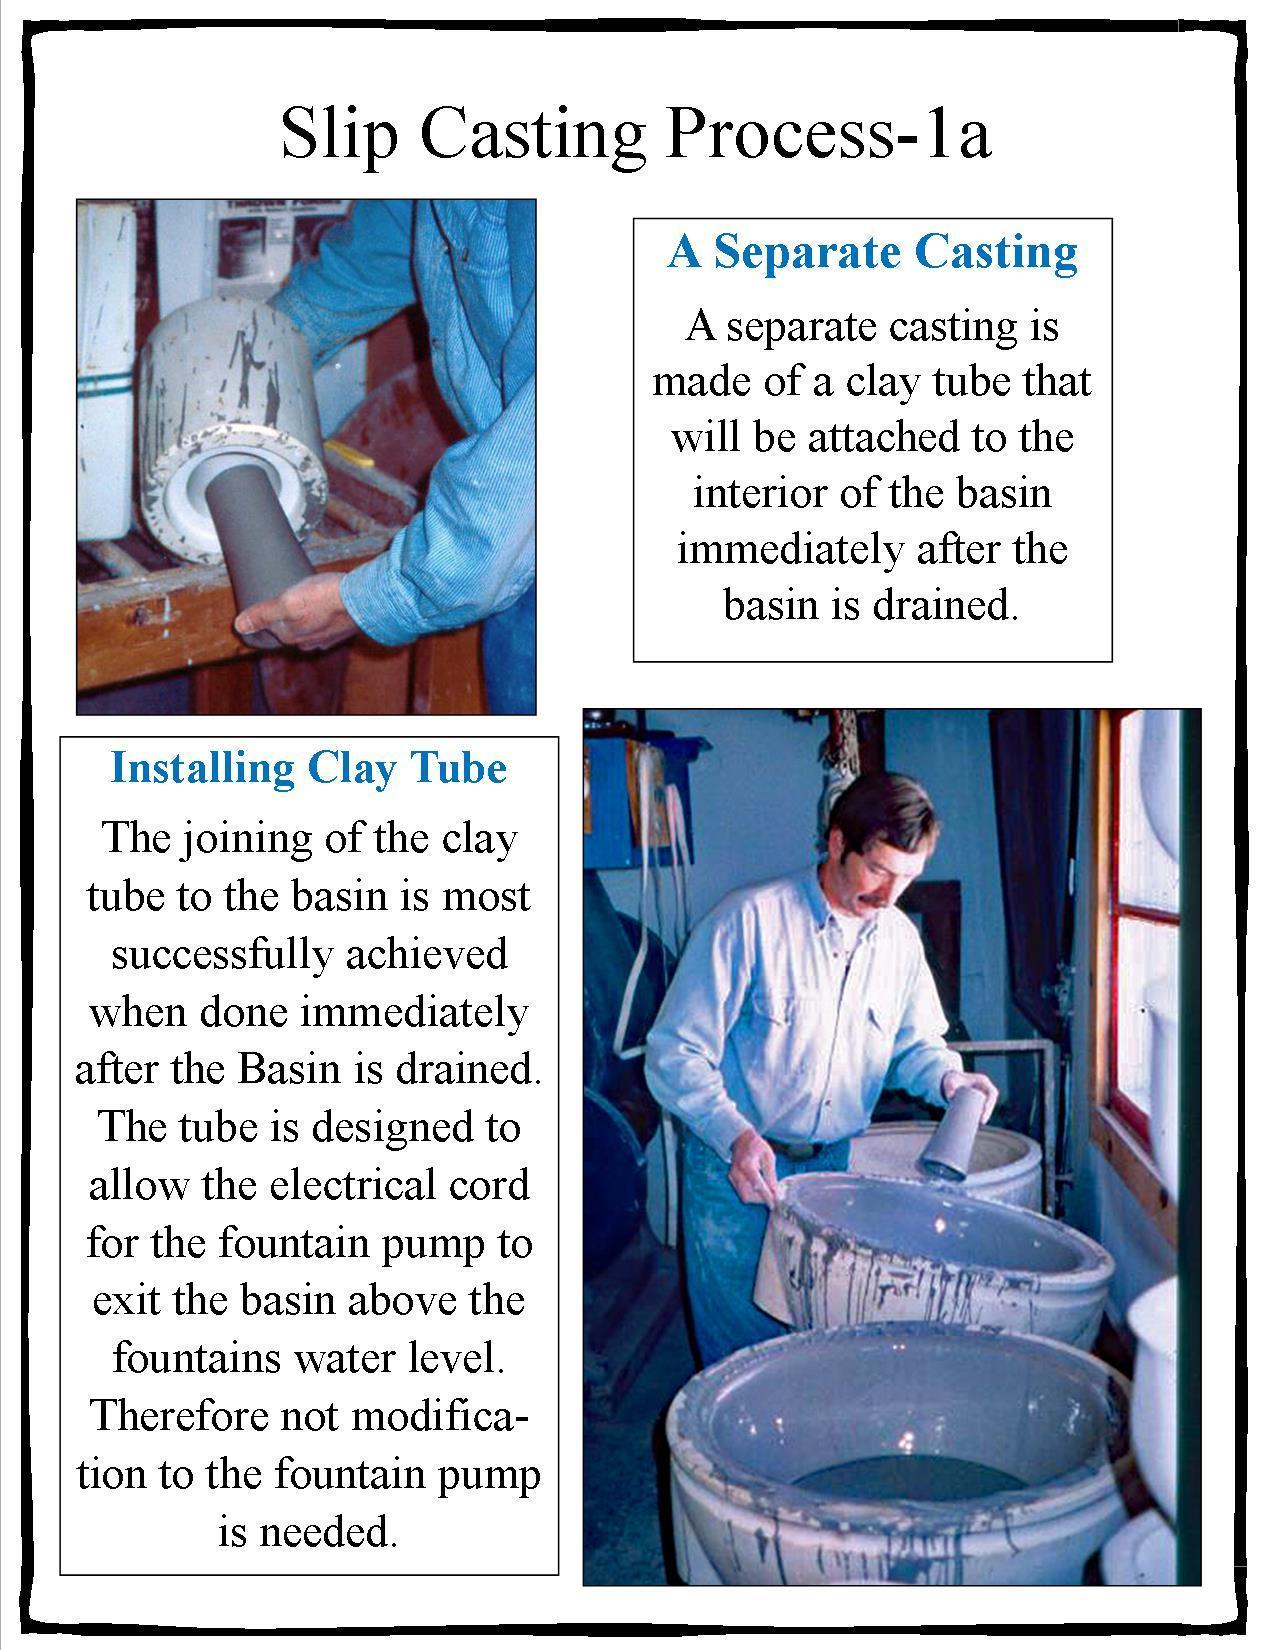 Slip Casting Process-1a